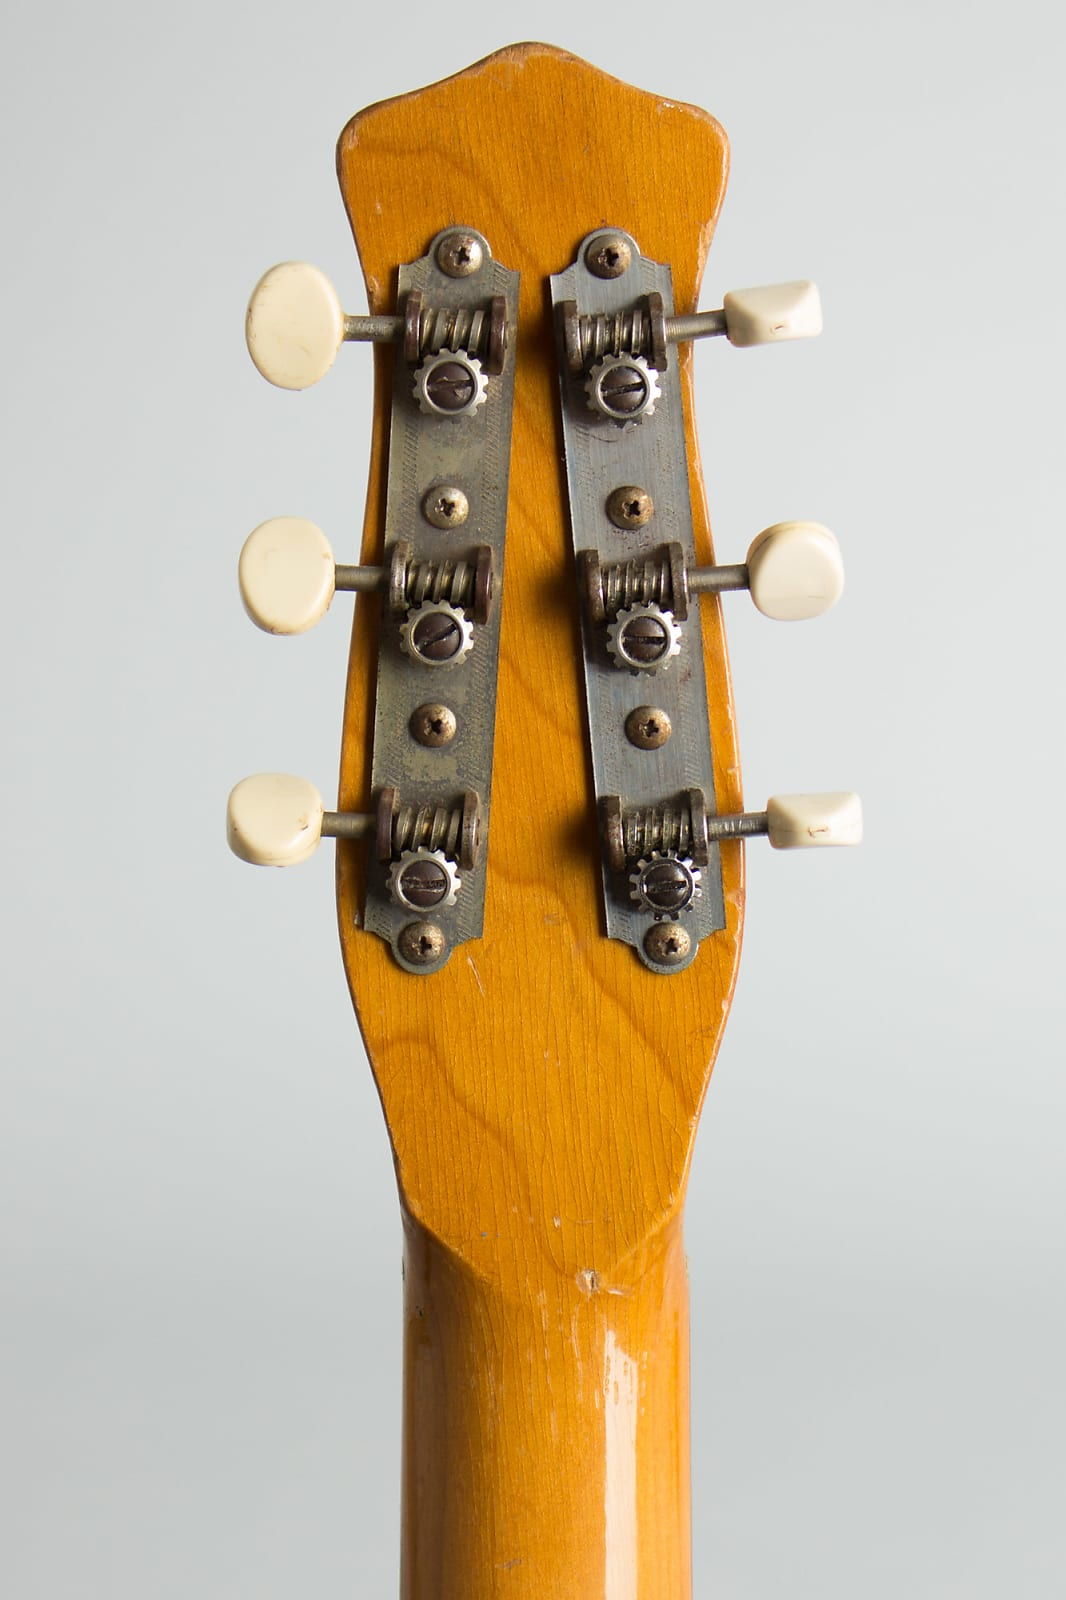 Danelectro  Standard Model 5025 Semi-Hollow Body Electric Guitar (1960), ser. #8040-0, black gig bag case.